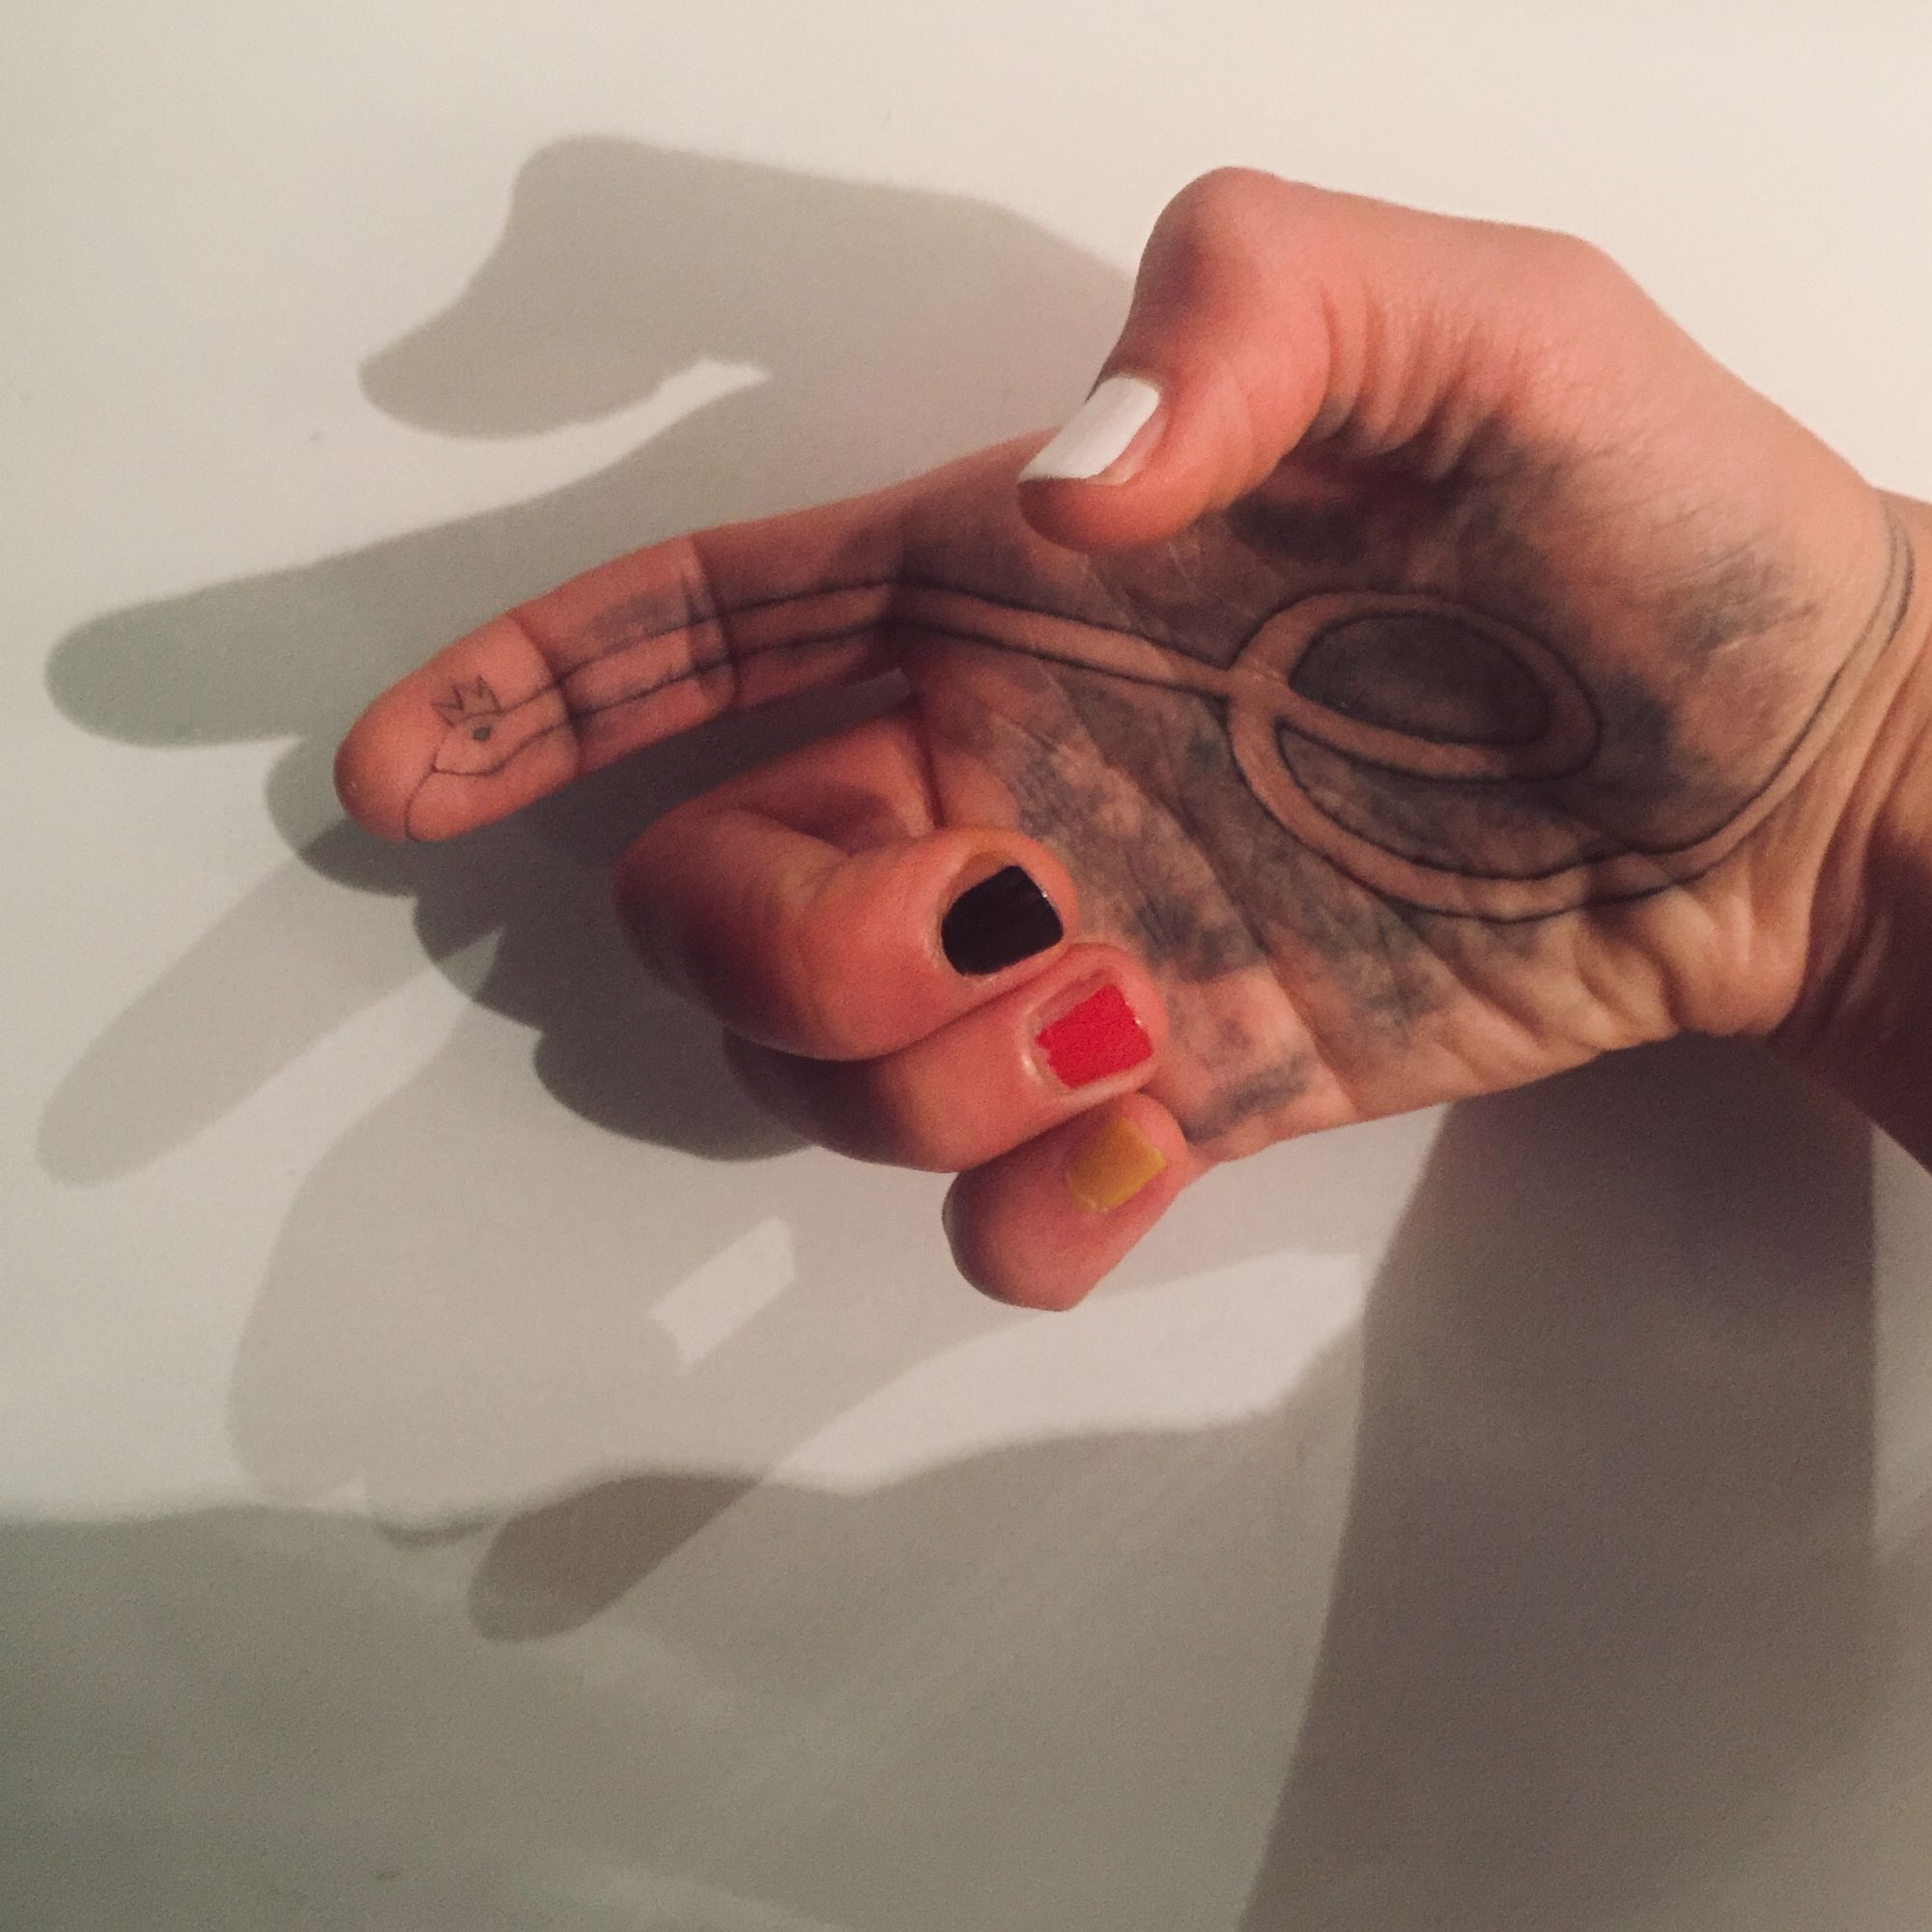 PARTICULAR SIGN: ARTIST OF SELF